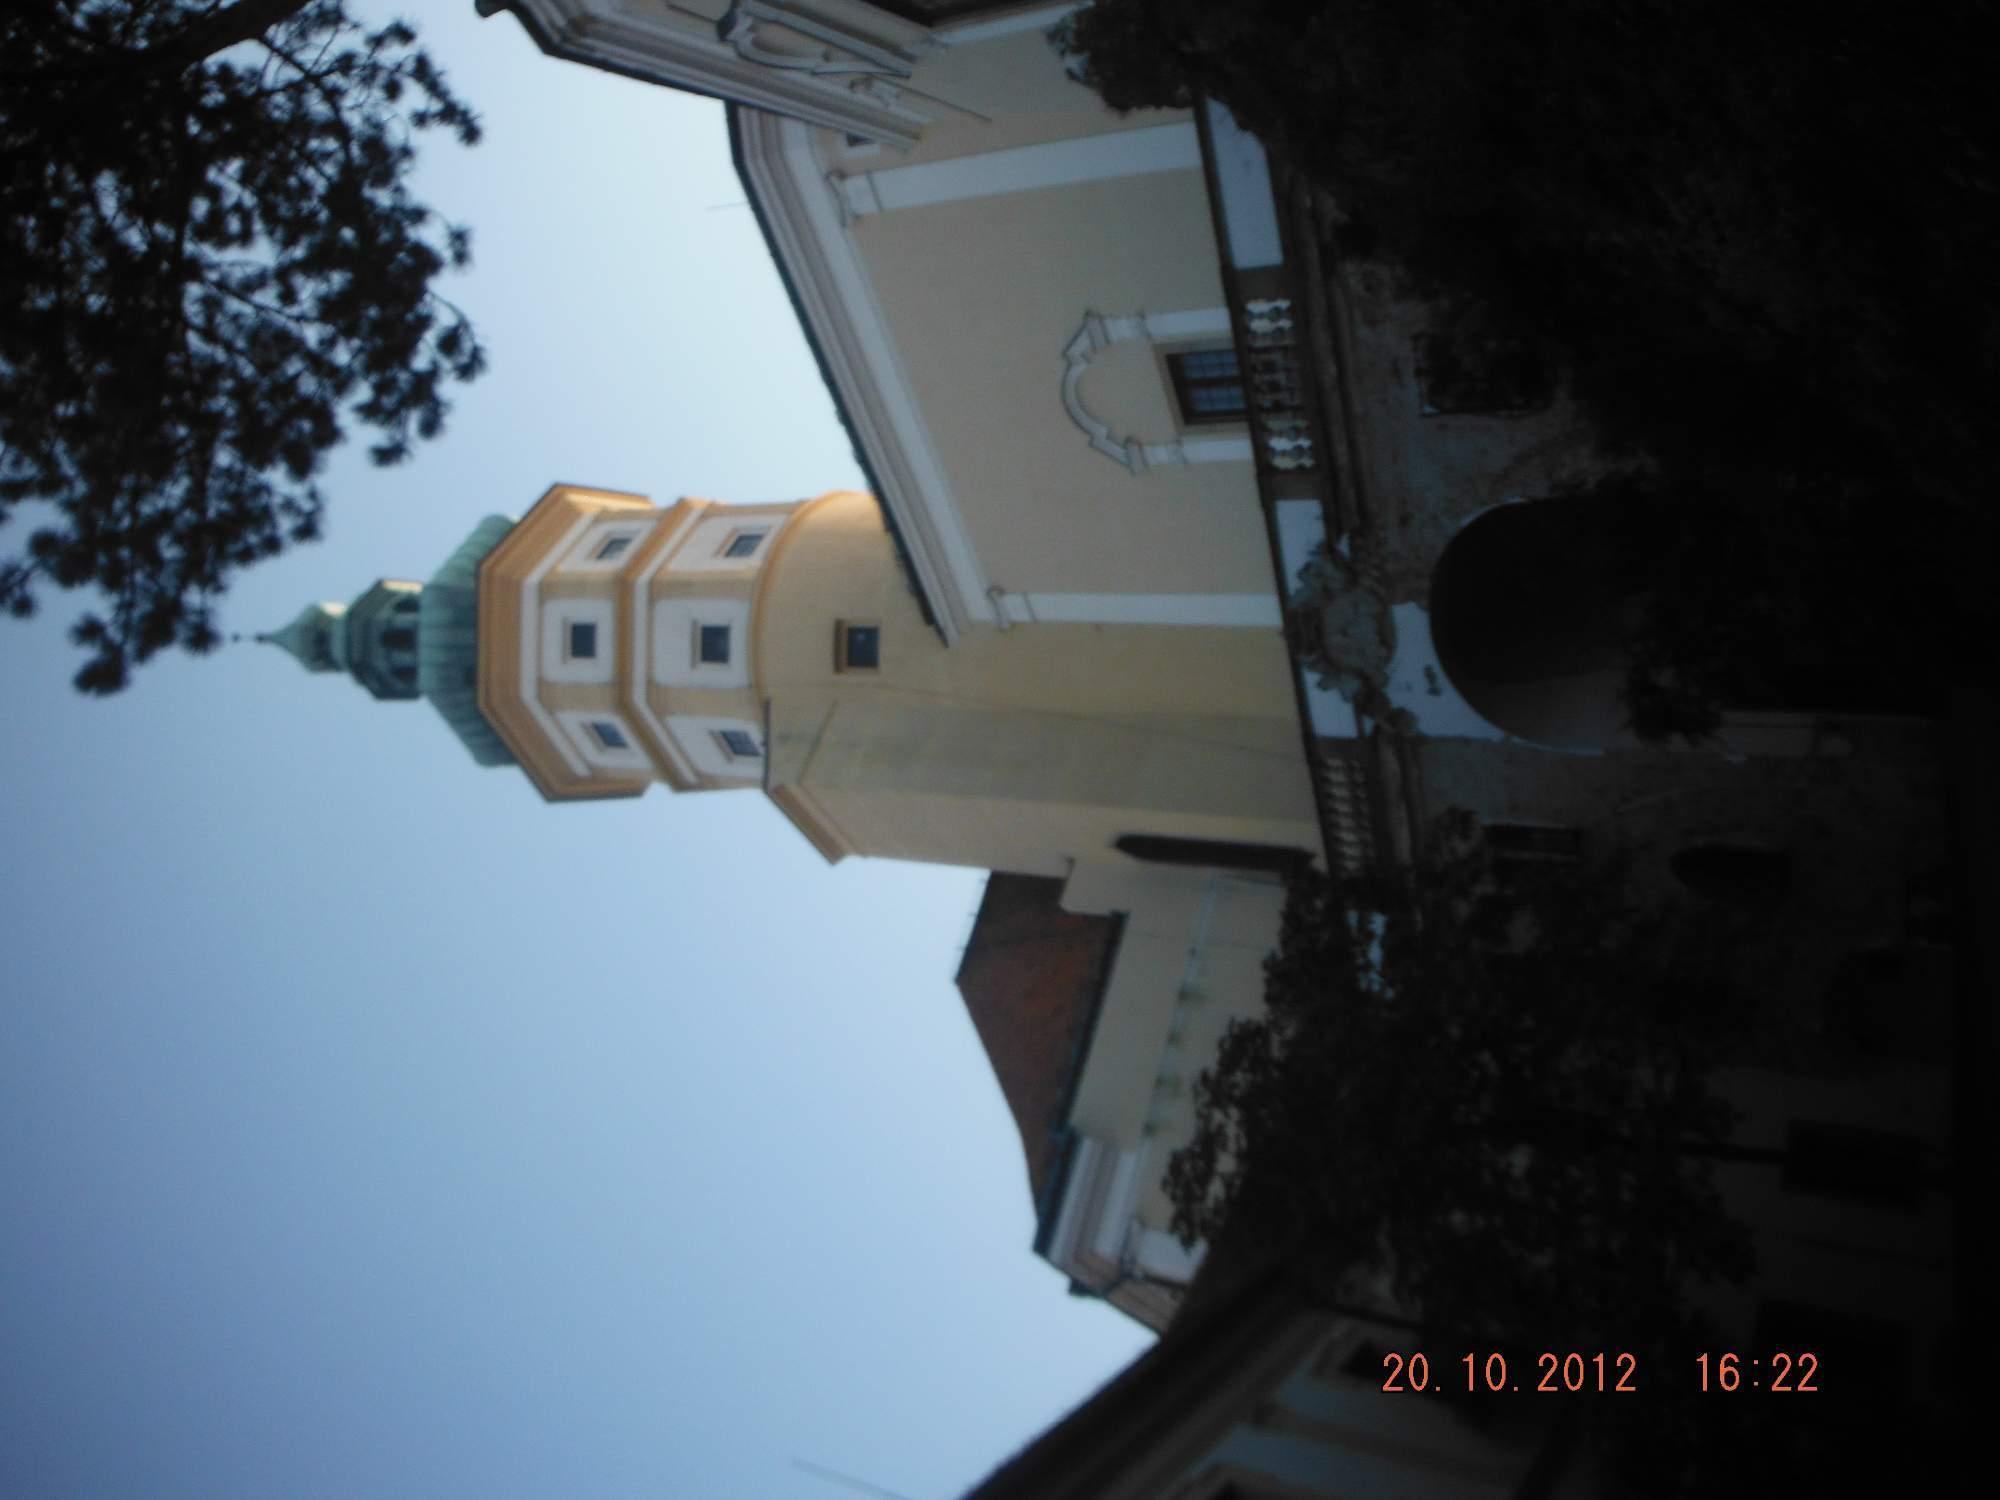 http://img24.rajce.idnes.cz/d2403/13/13214/13214242_a1e43f49e51a1daa7632f800d4edae3f/images/SAE638.jpg